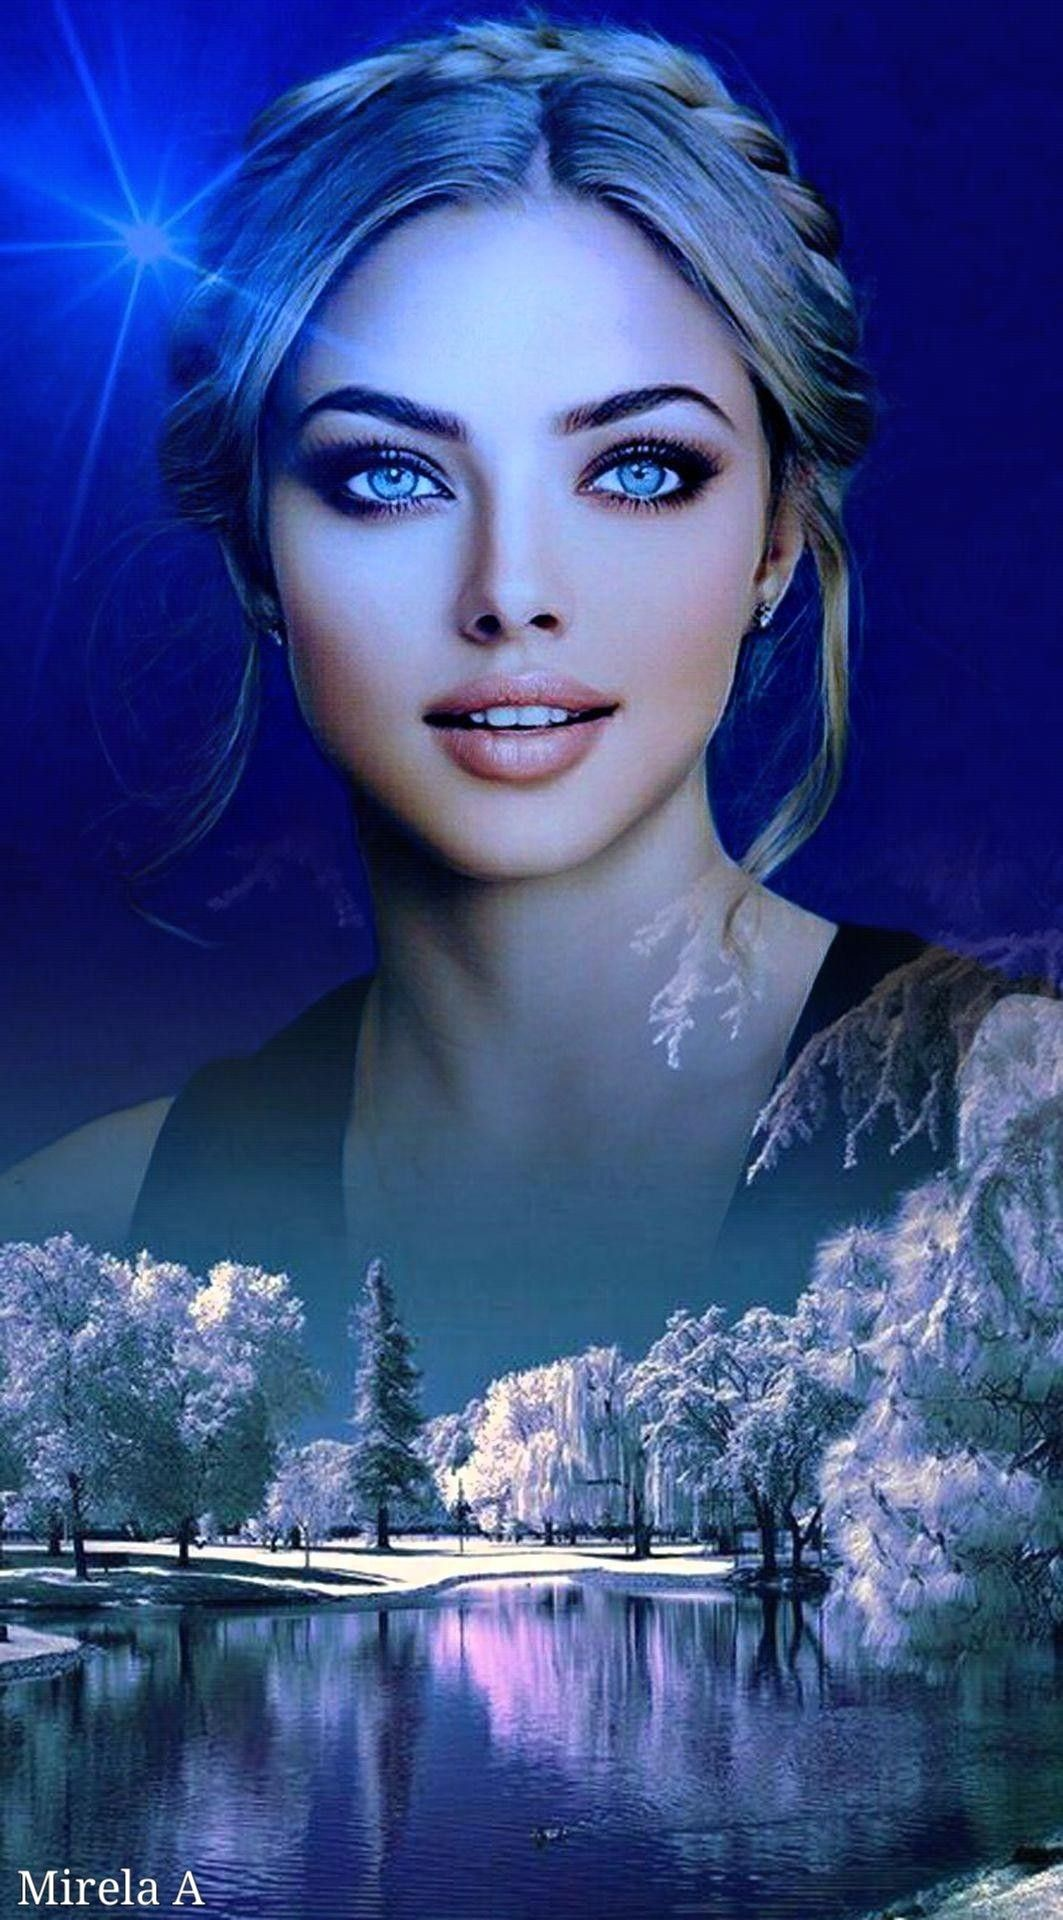 Pin By Ilap Hit On My Creations2 Mirela Anton Mirela A In 2021 Beautiful Art Paintings Fantasy Art Women Beauty Art